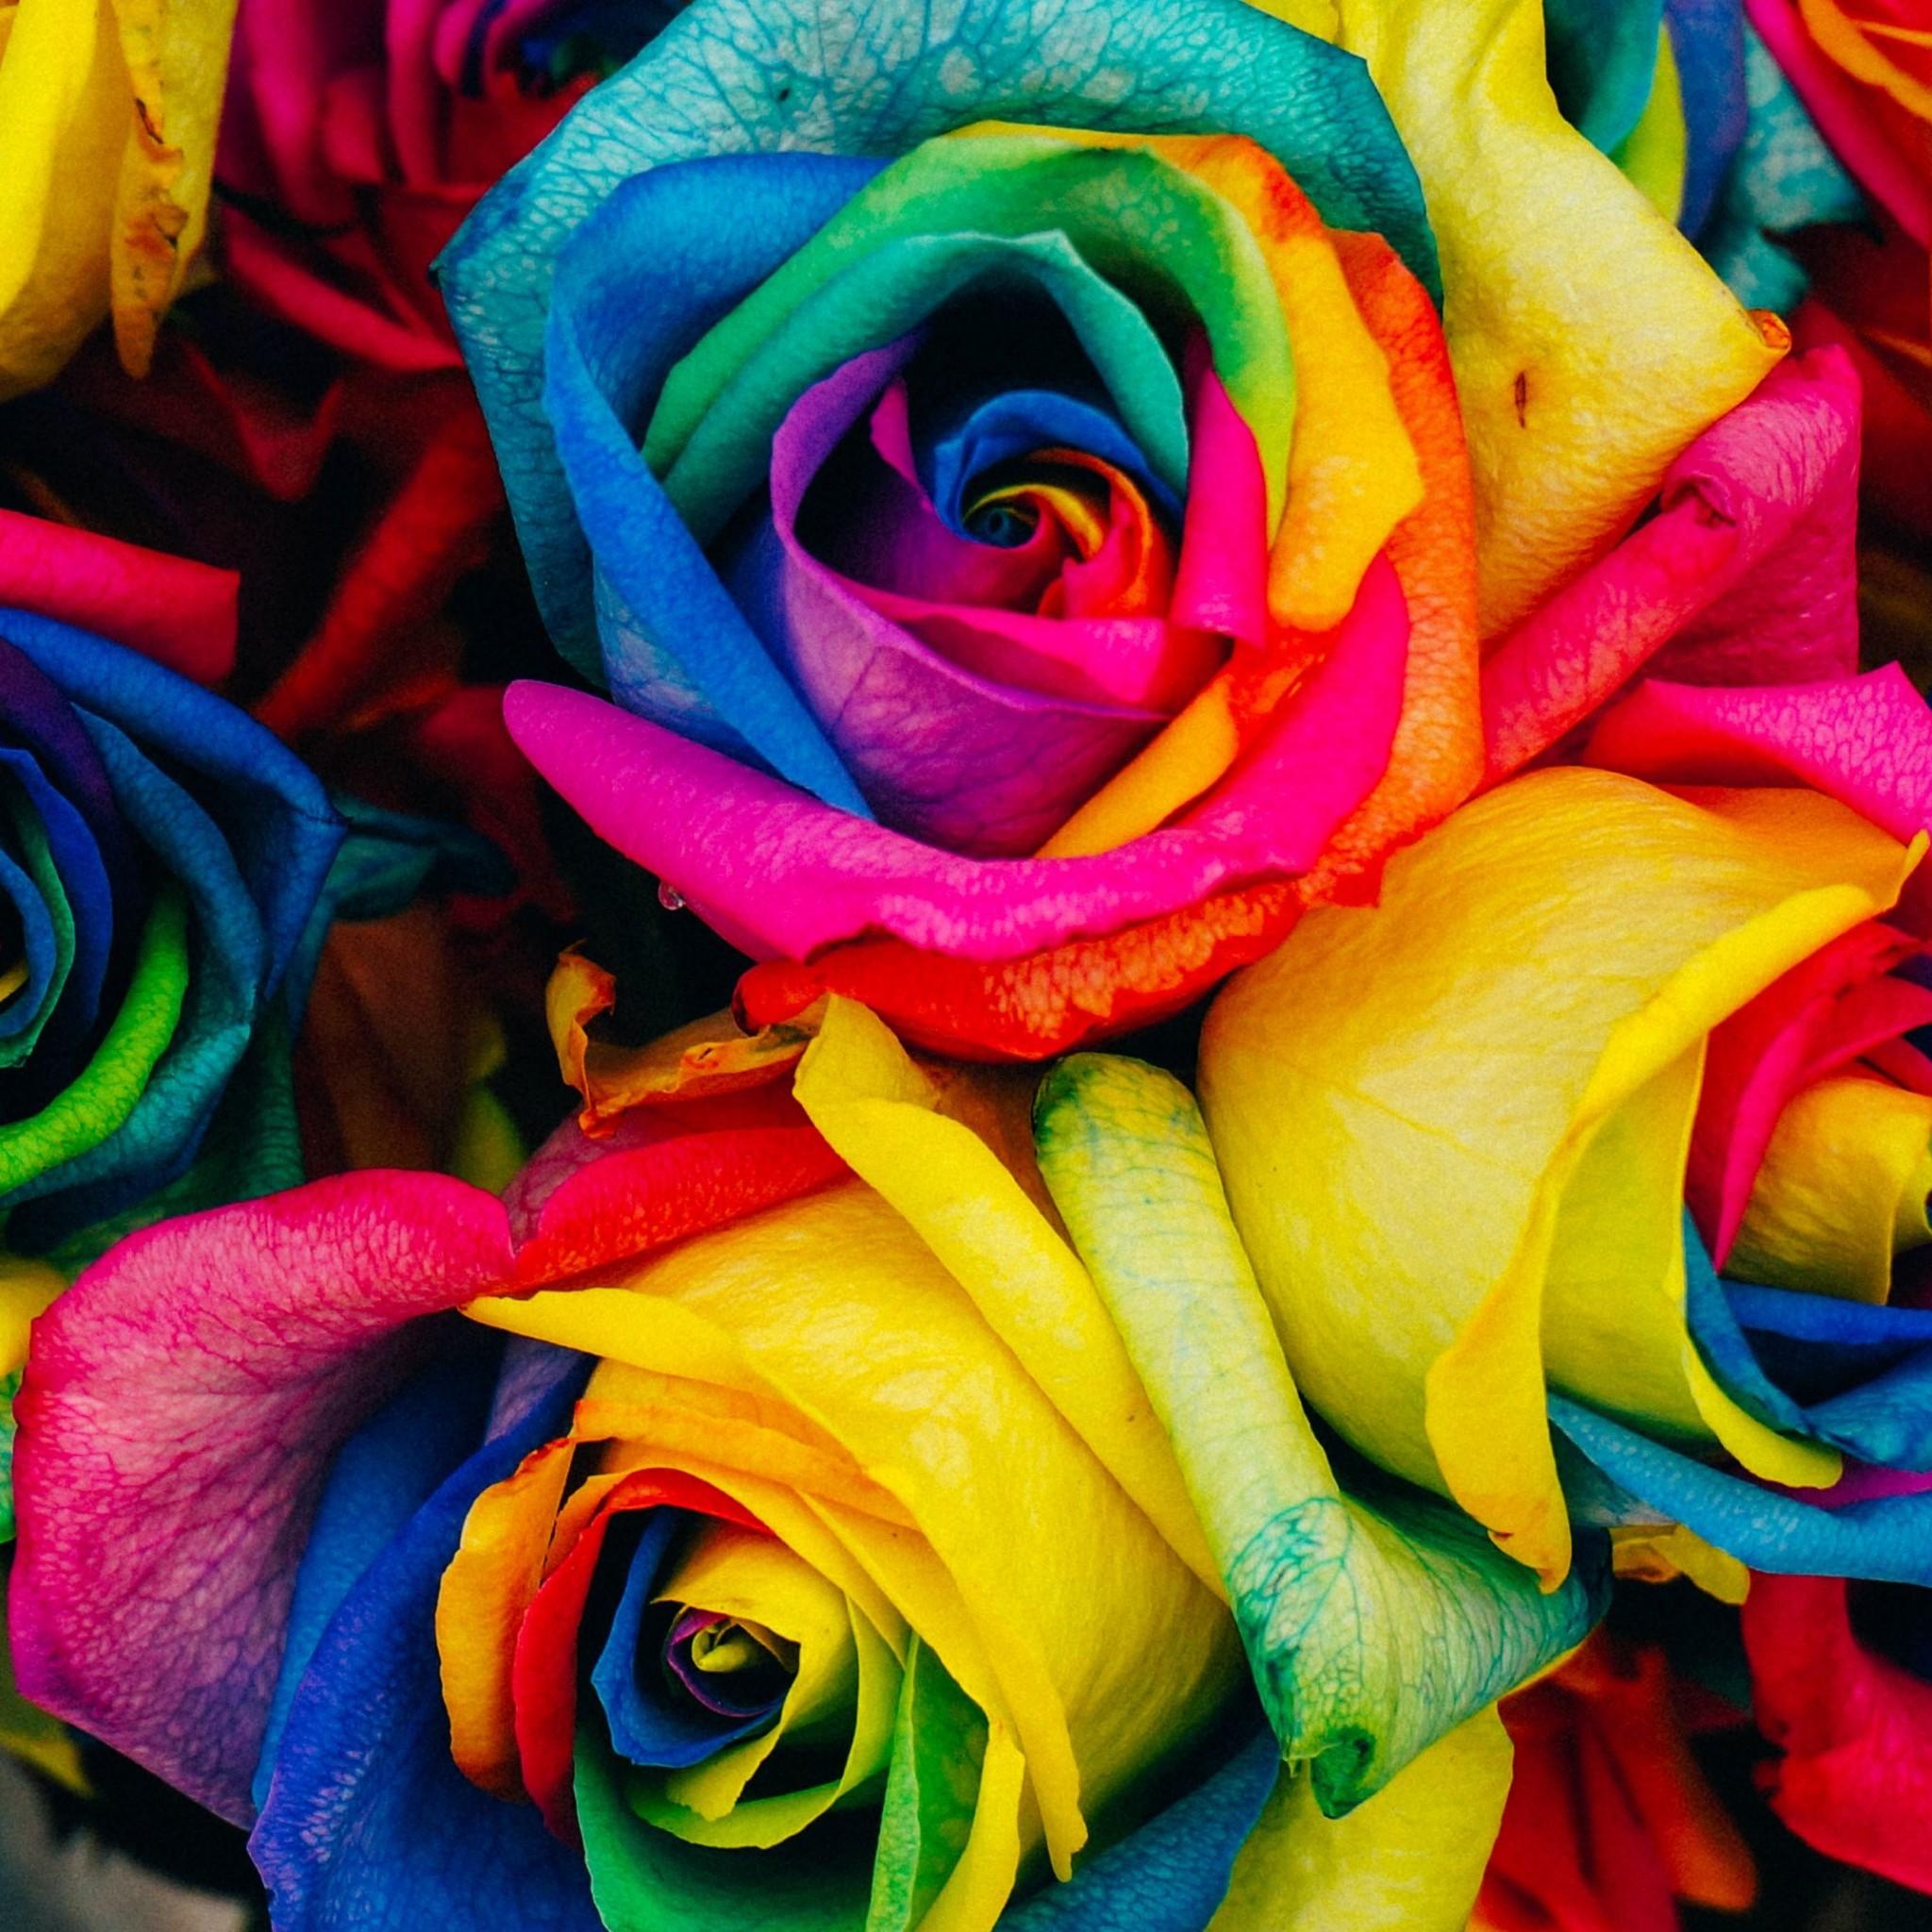 Rainbow Flower Wallpaper ·①